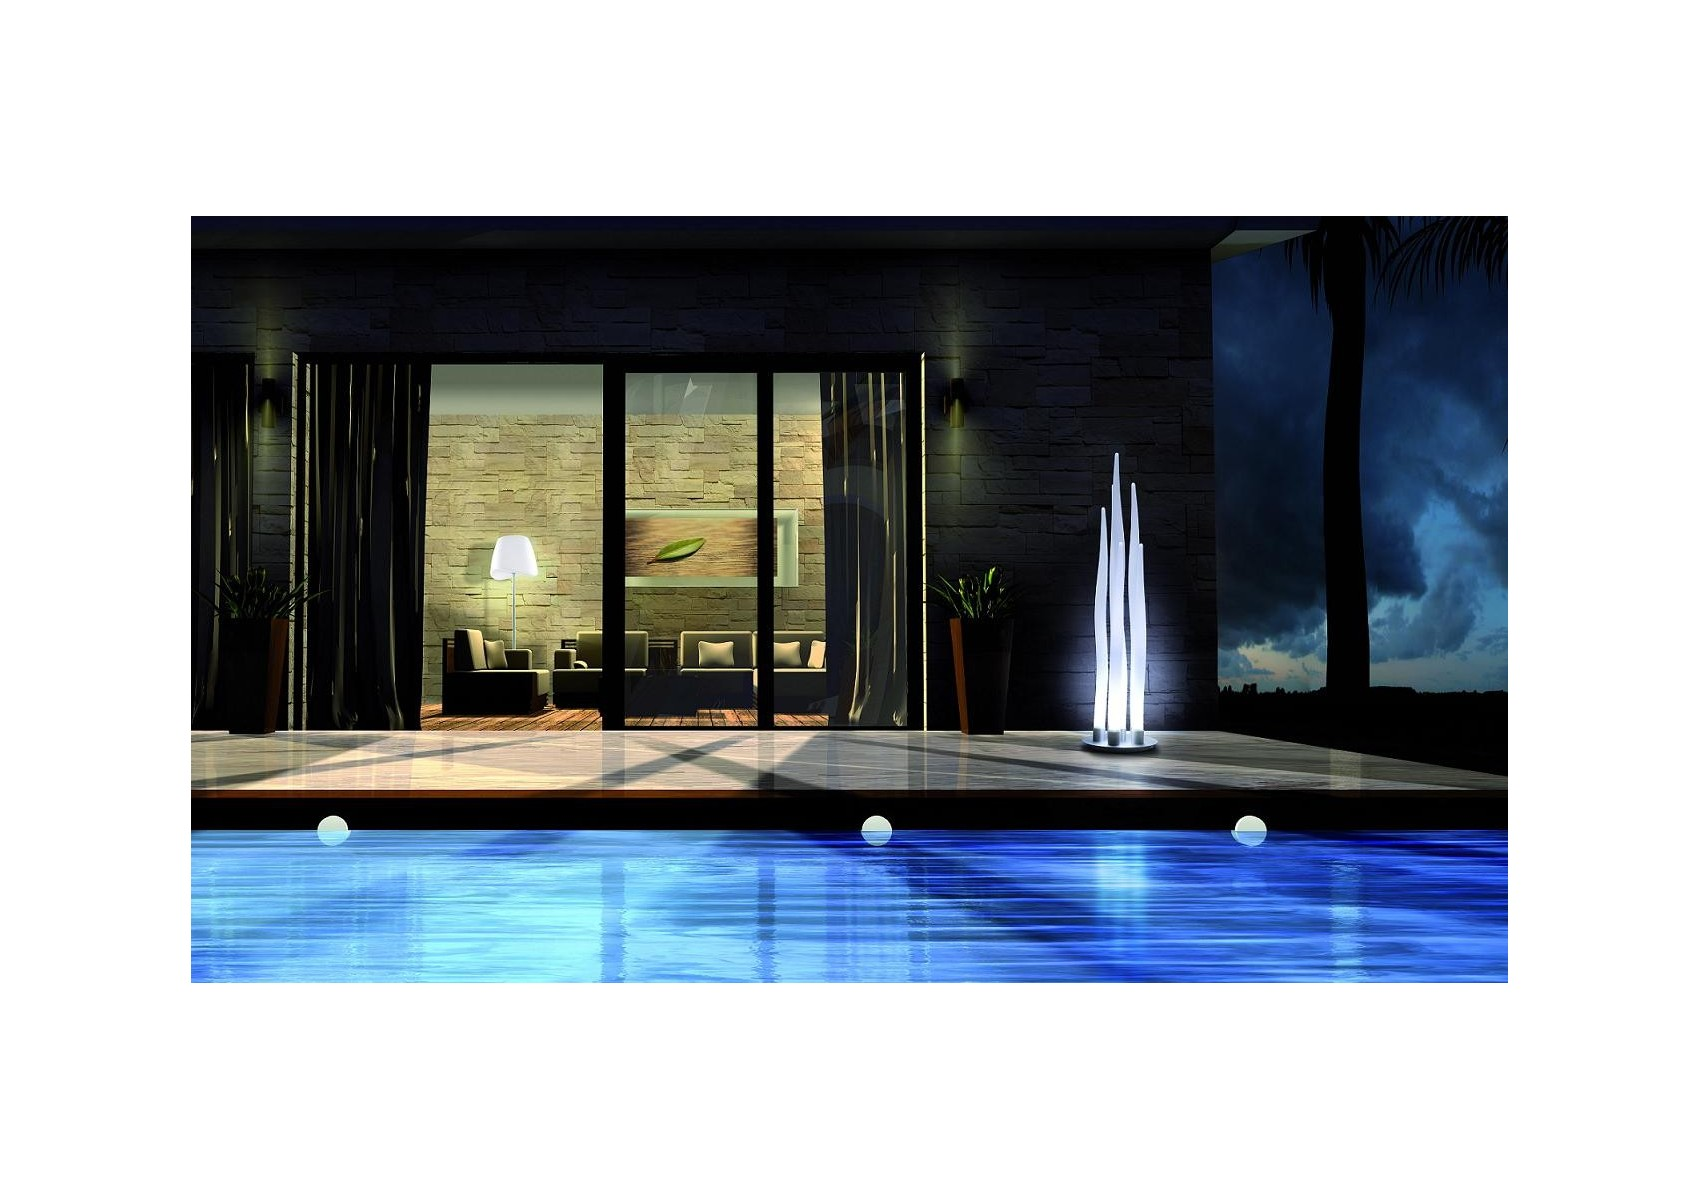 lampe poser design d 39 ext rieur de la collection estalaca. Black Bedroom Furniture Sets. Home Design Ideas